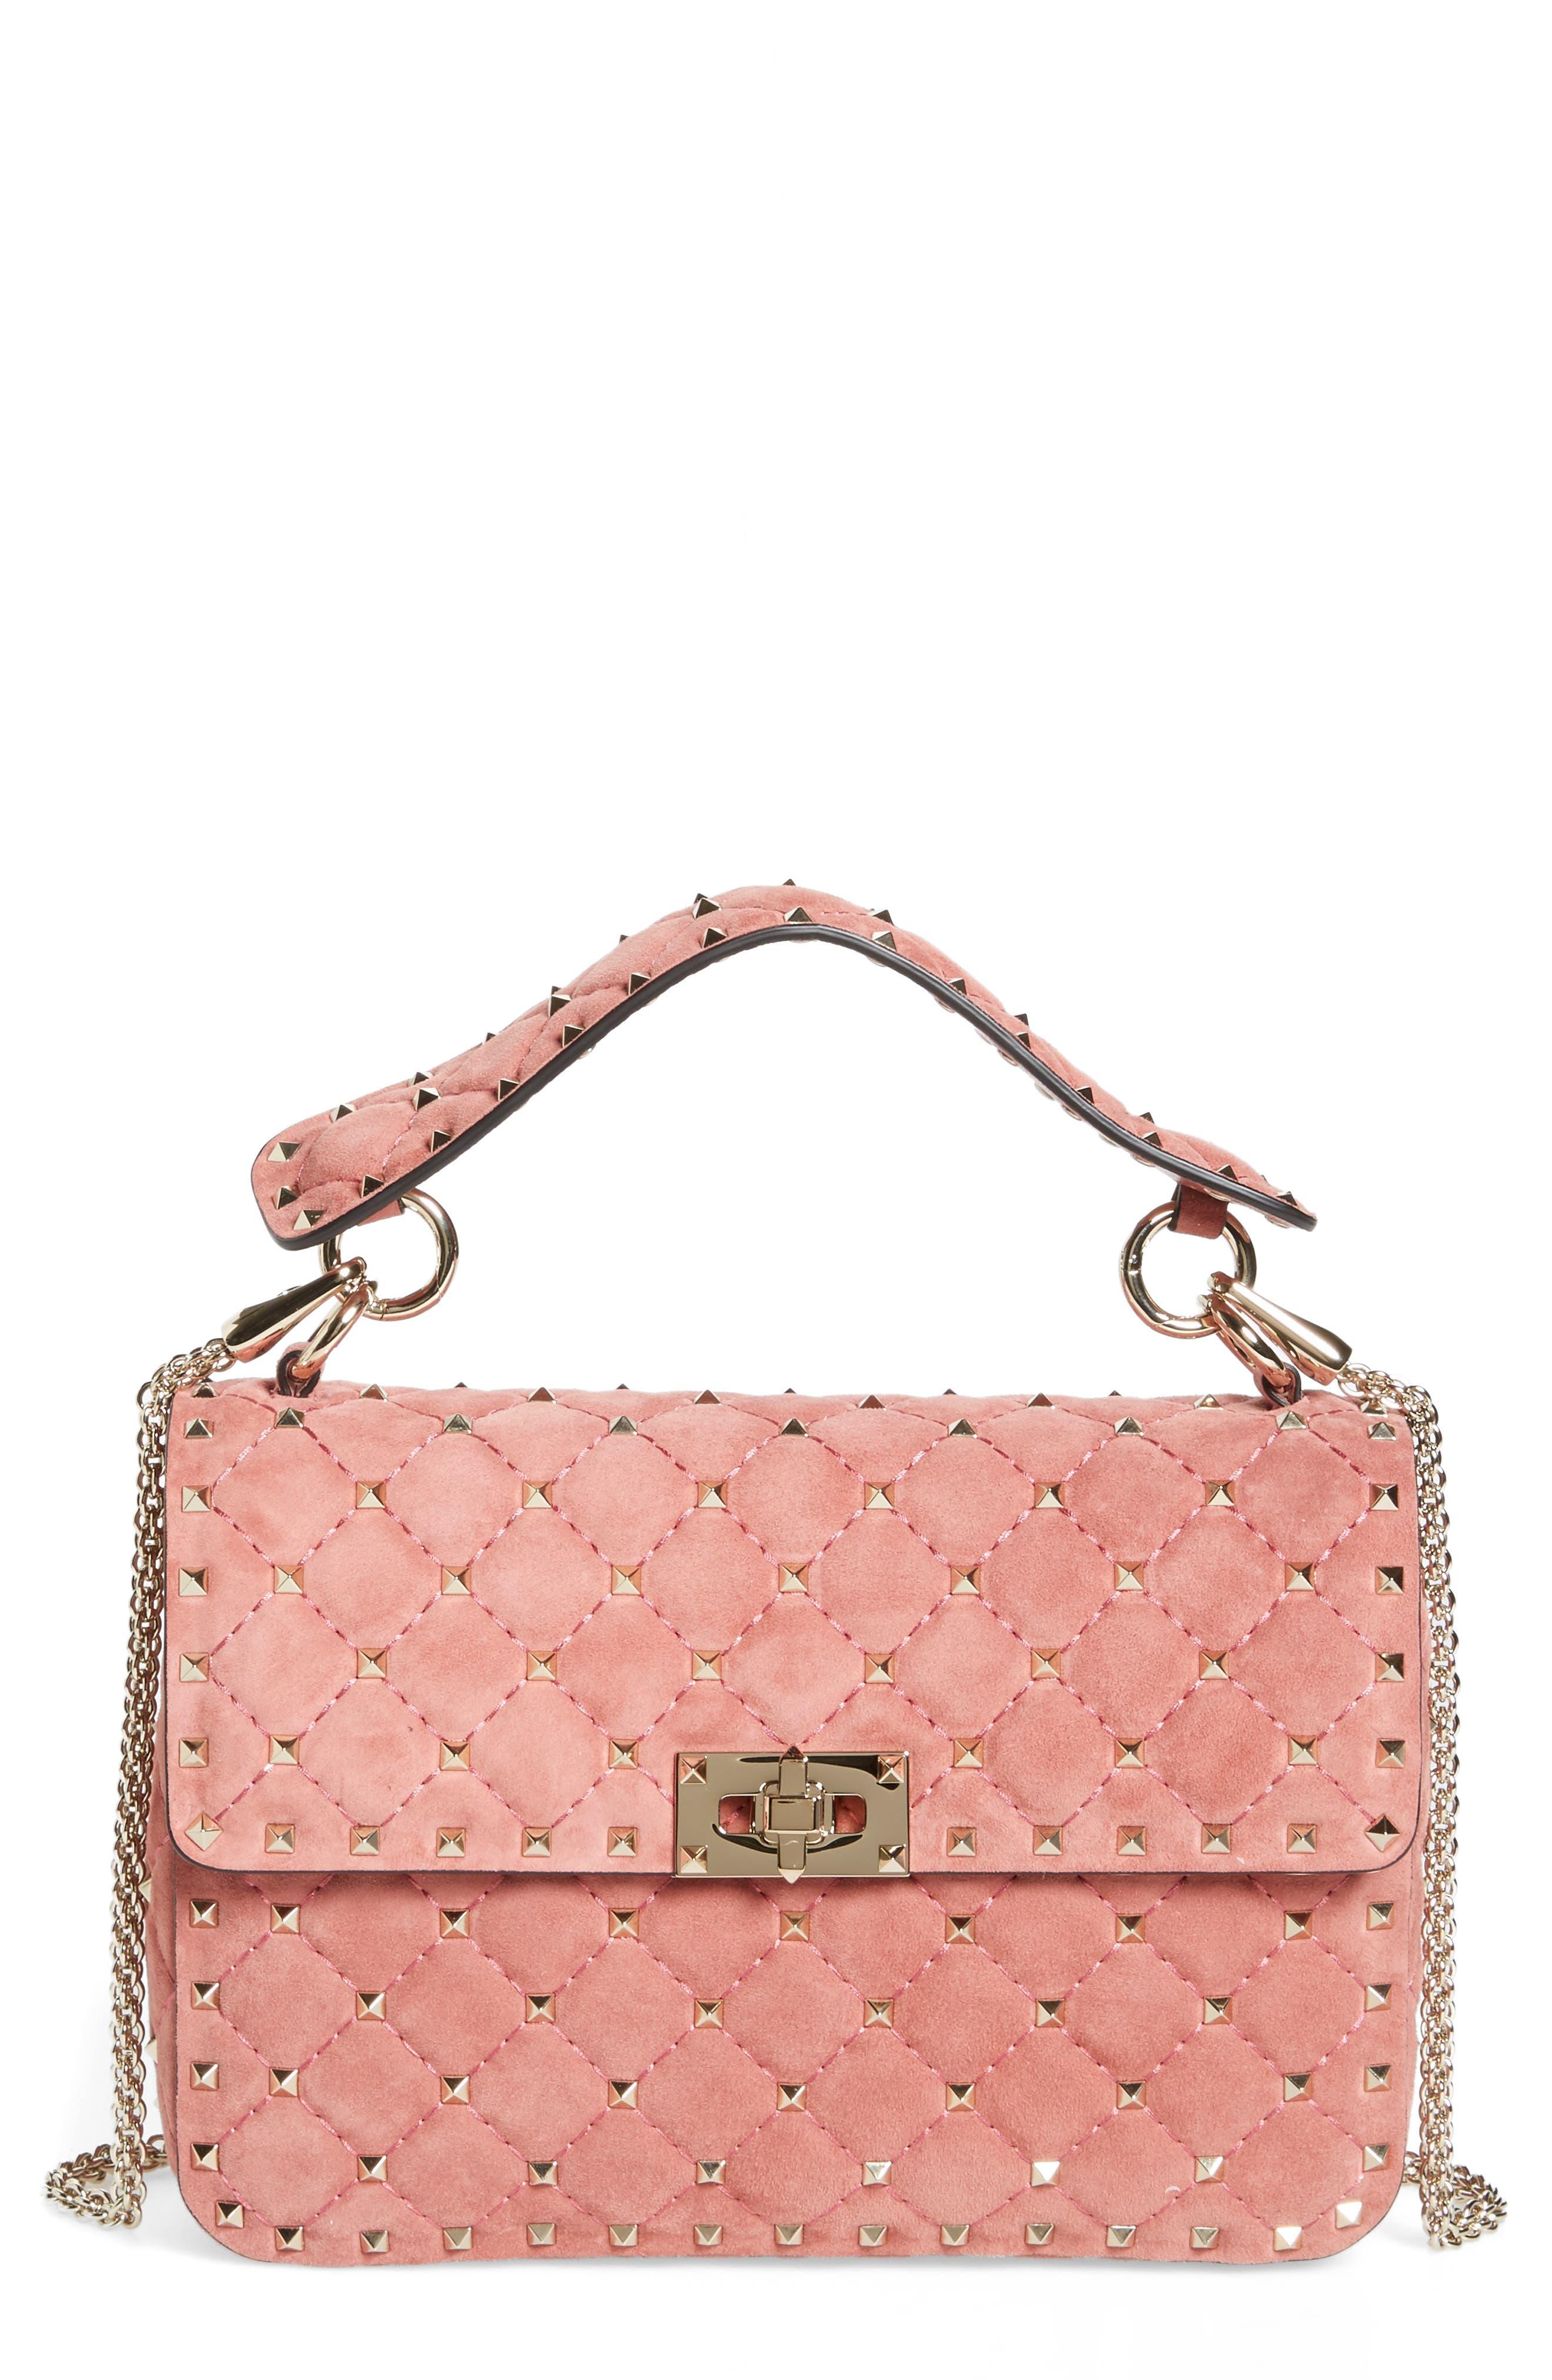 Valentino Rockstud Spike Leather Top Handle Crossbody Bag